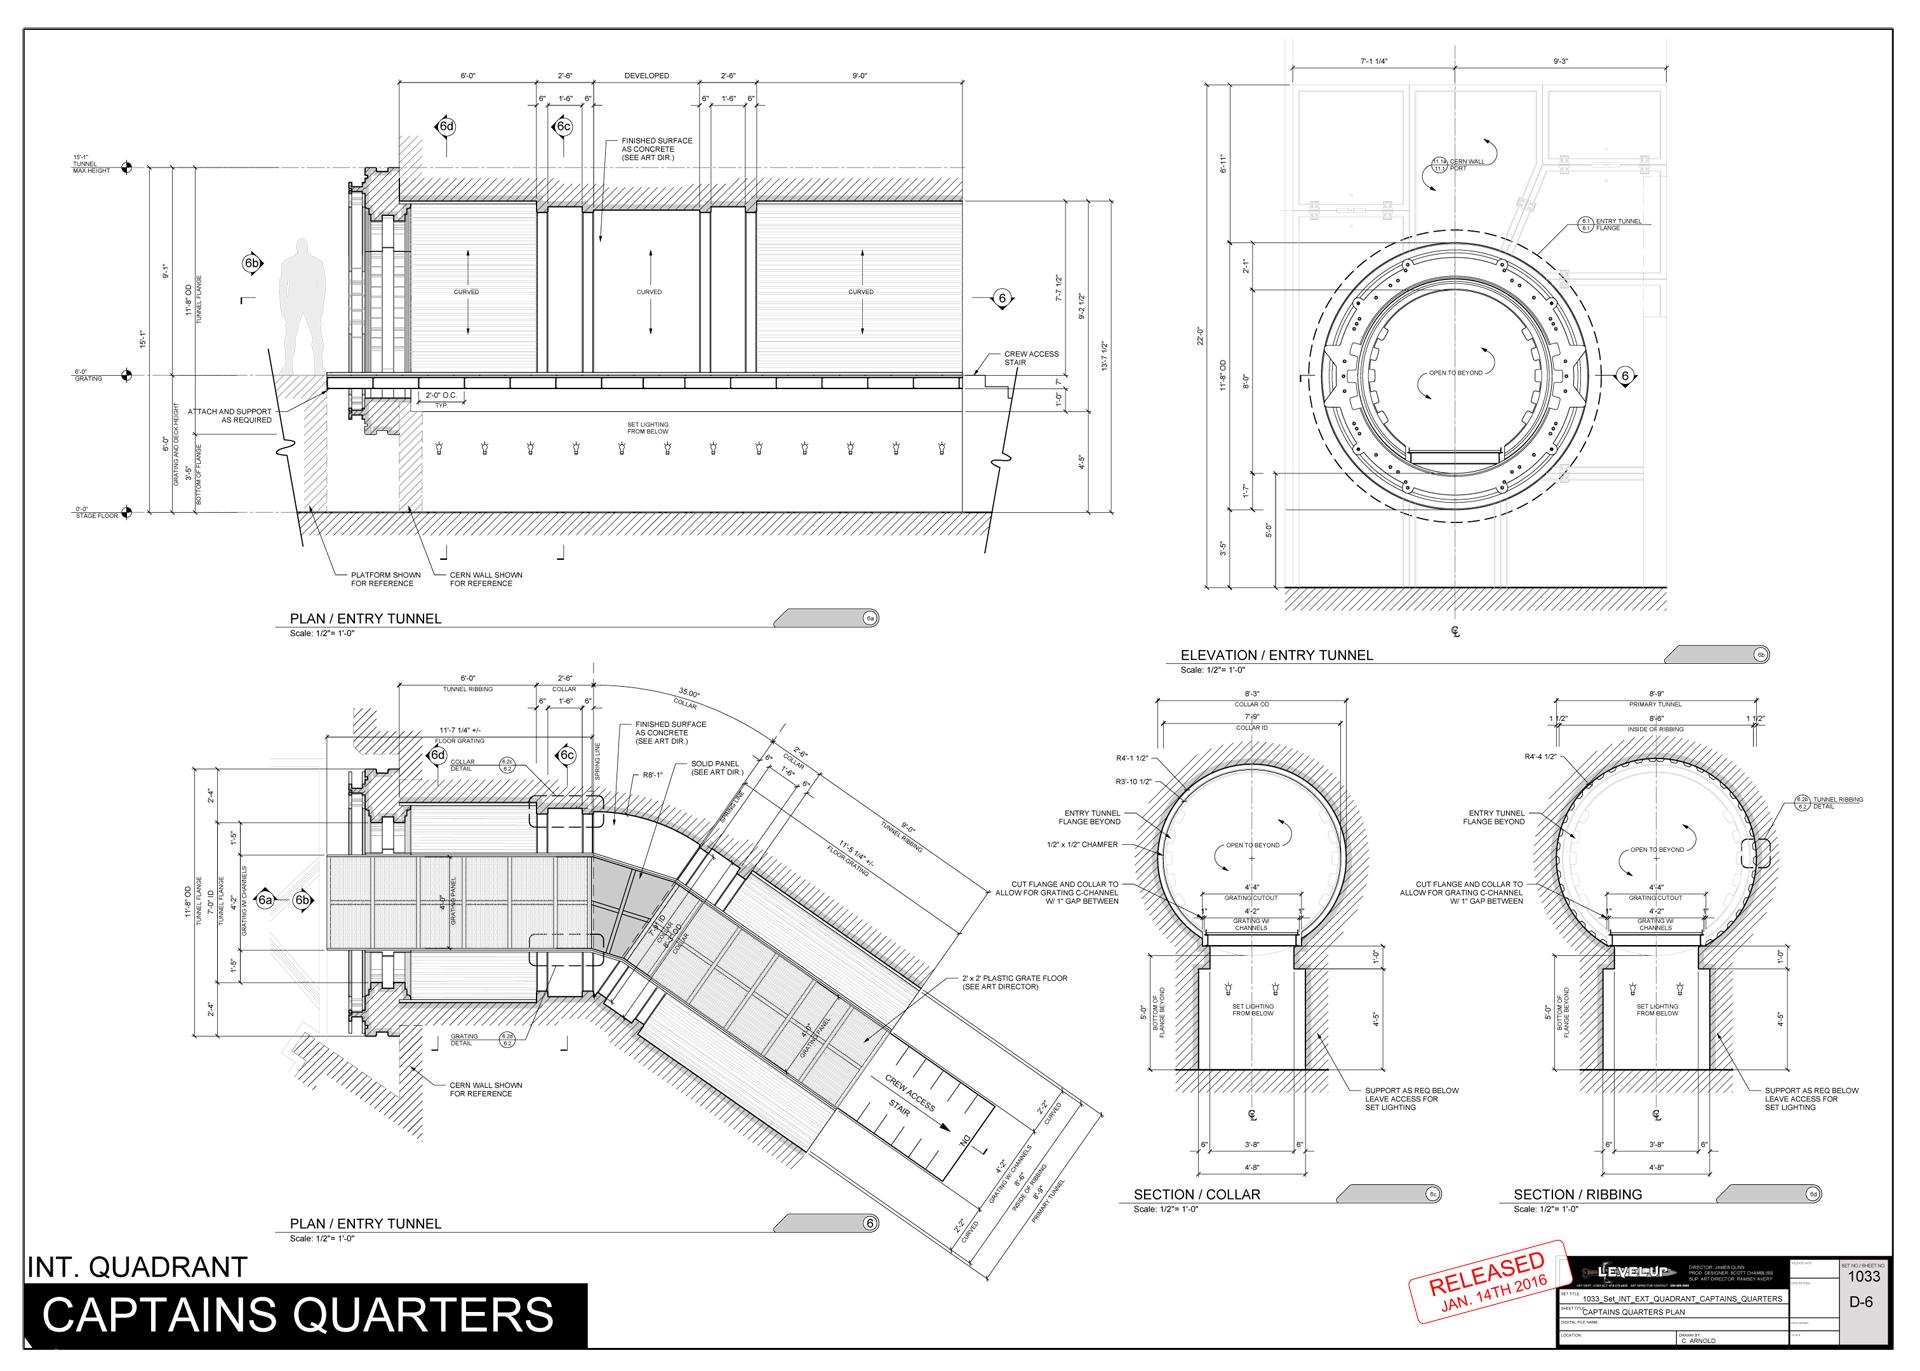 1033_Set_Quadrant_Quarters_INT_D-6_160114_TUNNEL_V001_RELEASED_CA.jpg